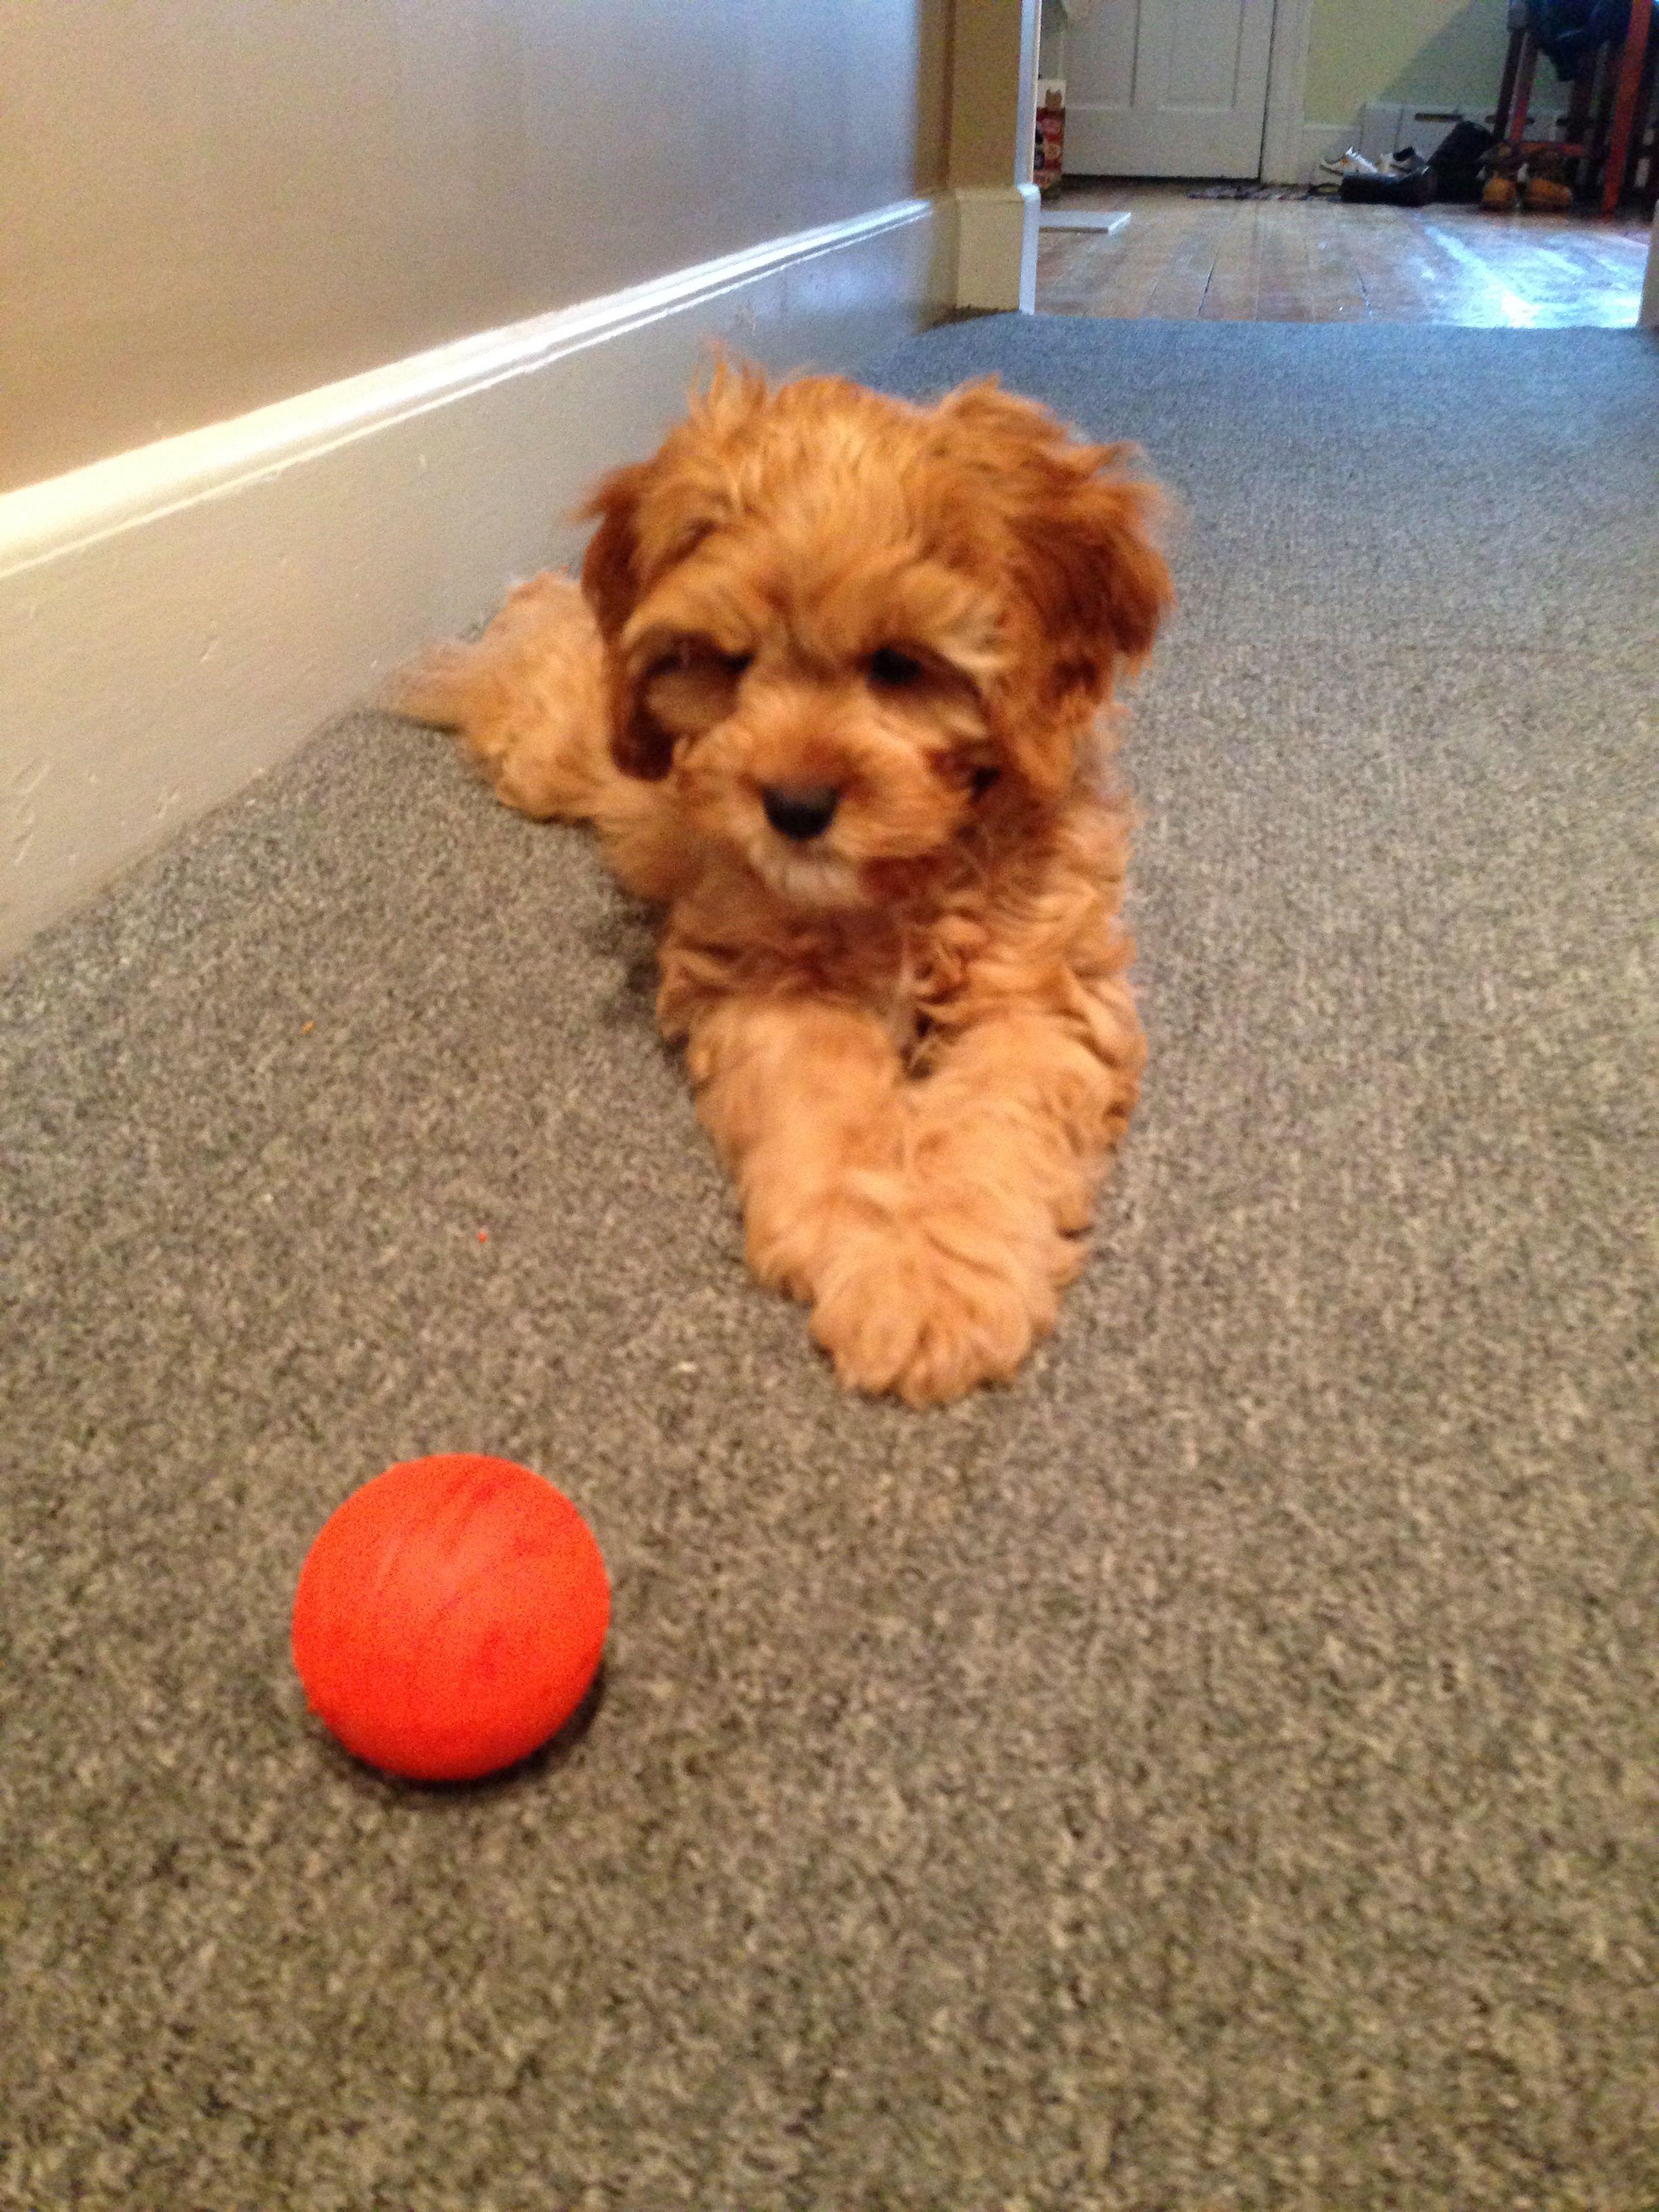 Pin By Cheryl Milnes On Too Cute Animals Cavapoo Puppies Cavapoo Puppies